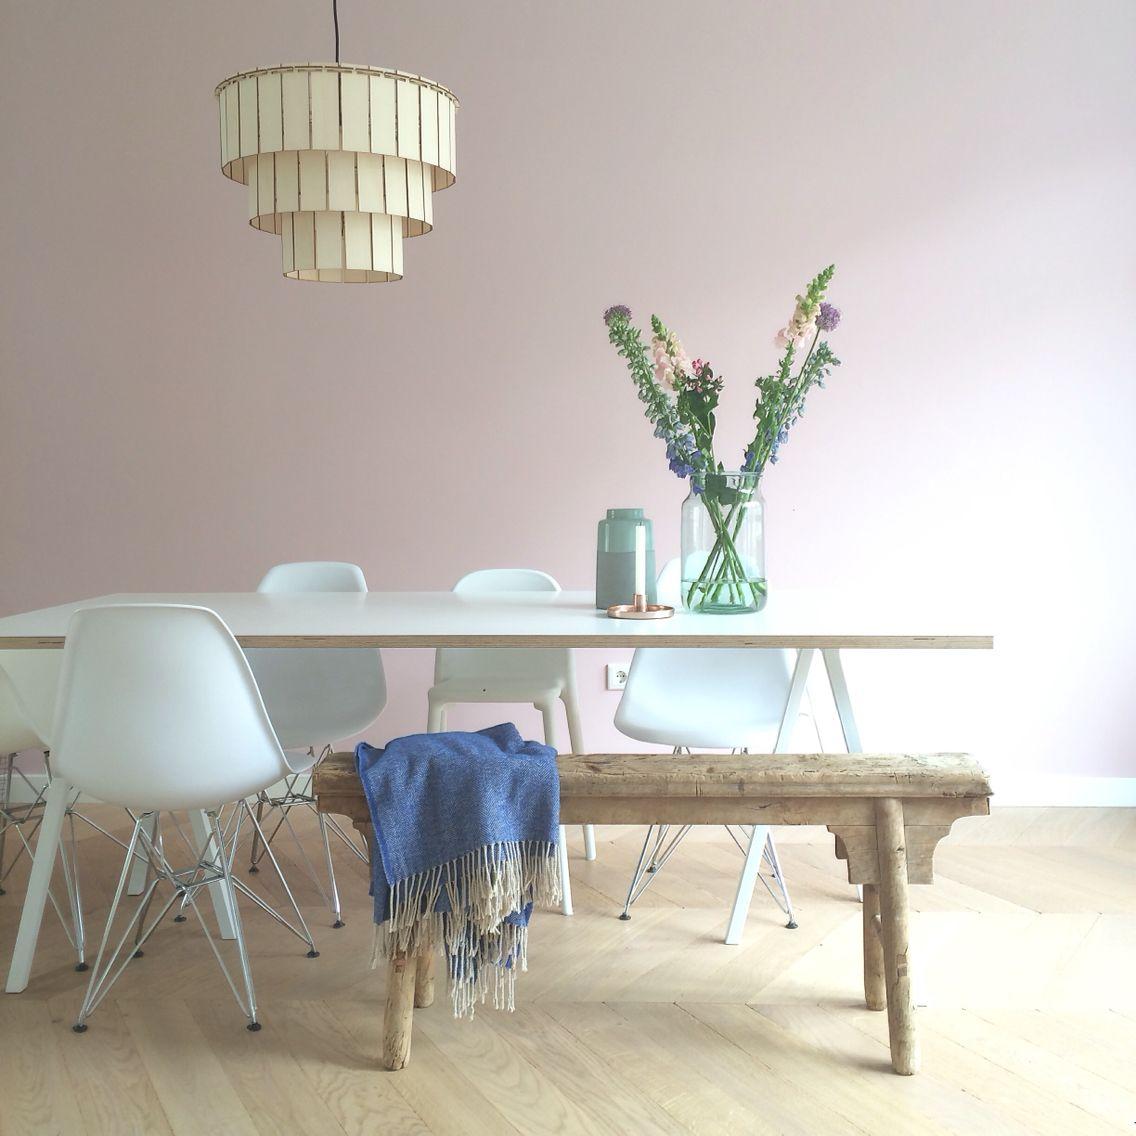 Hauptfarben-design-bilder pink wall hay loop stand table and wooden lighting designed by